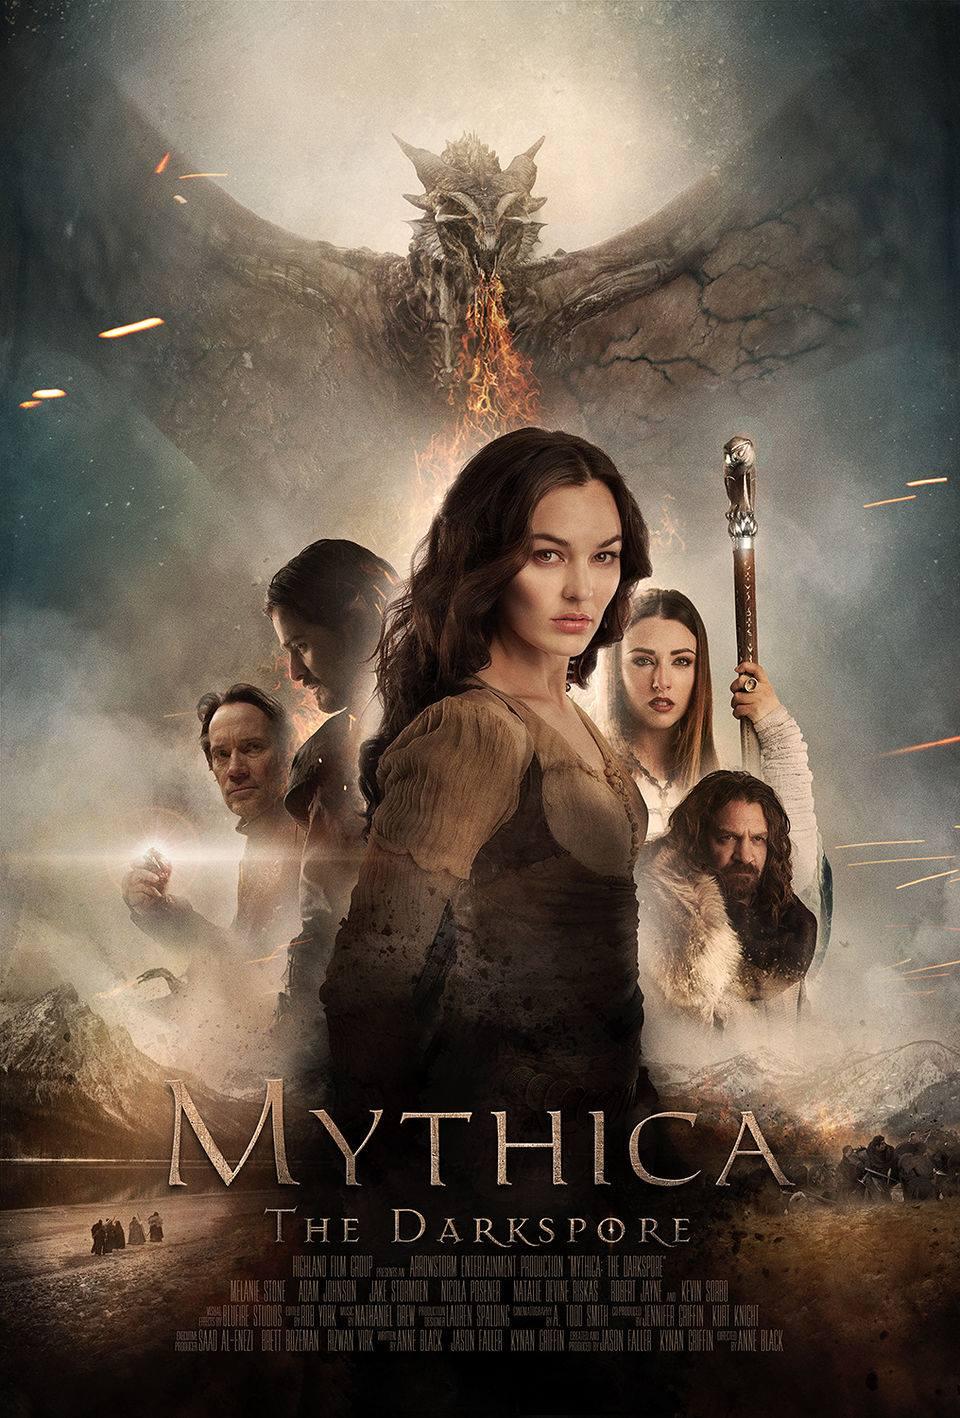 Mythica The Darkspore.jpg